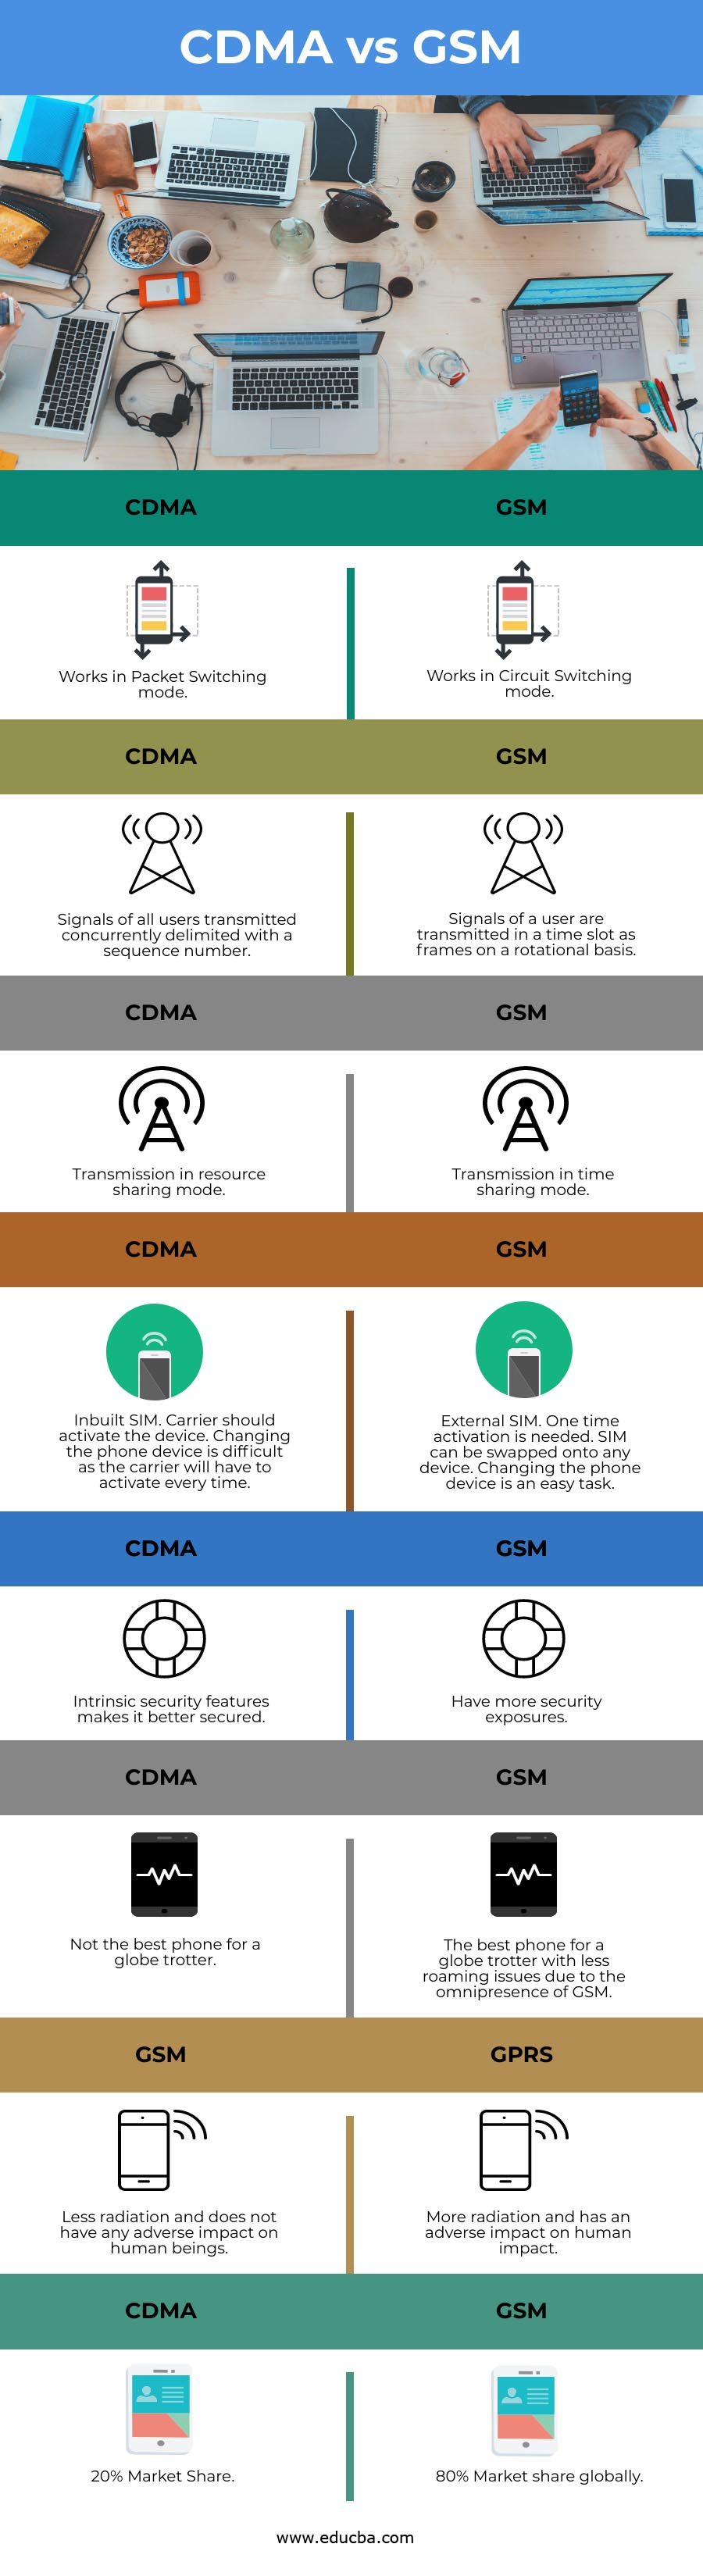 CDMA vs GSM info